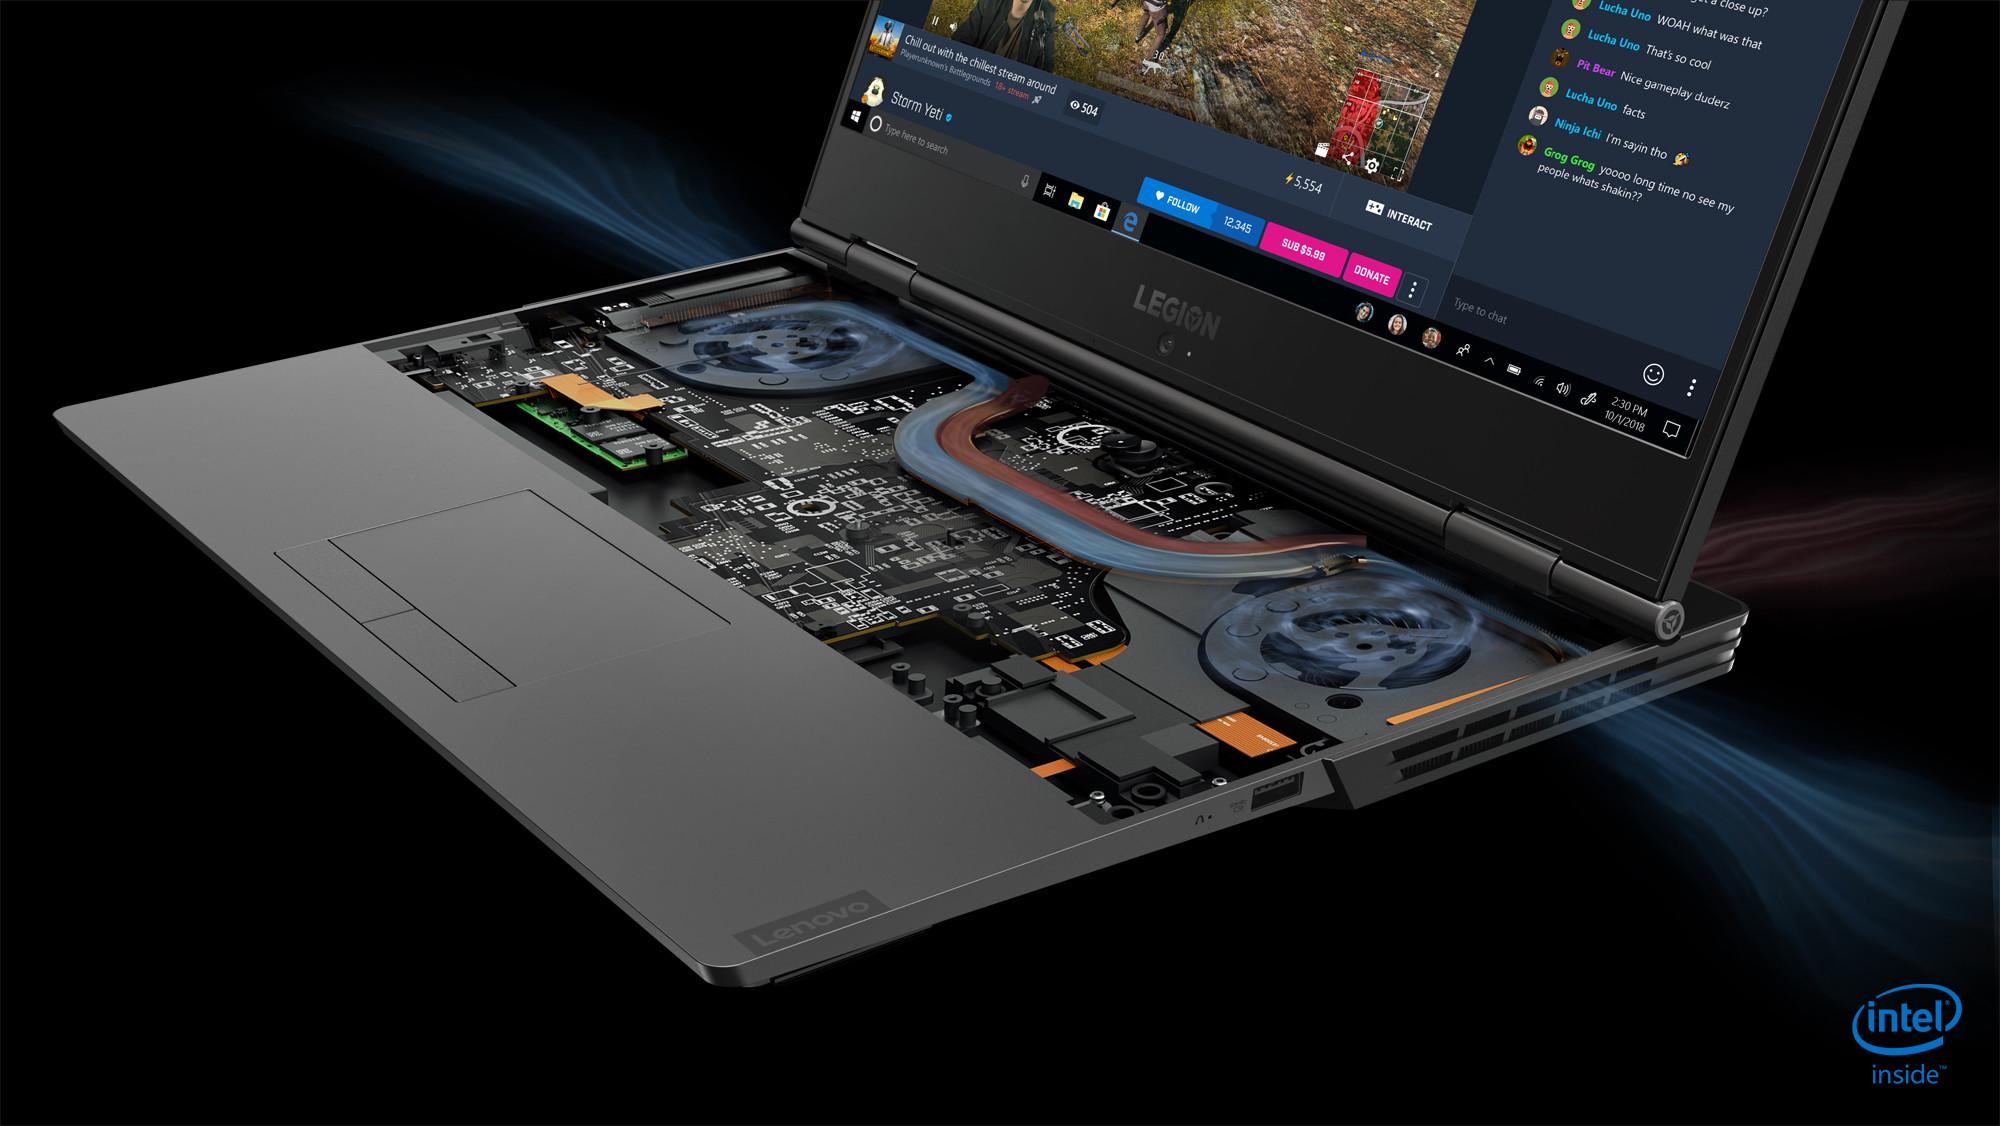 Lenovo's new Legion gaming laptops have Nvidia RTX graphics